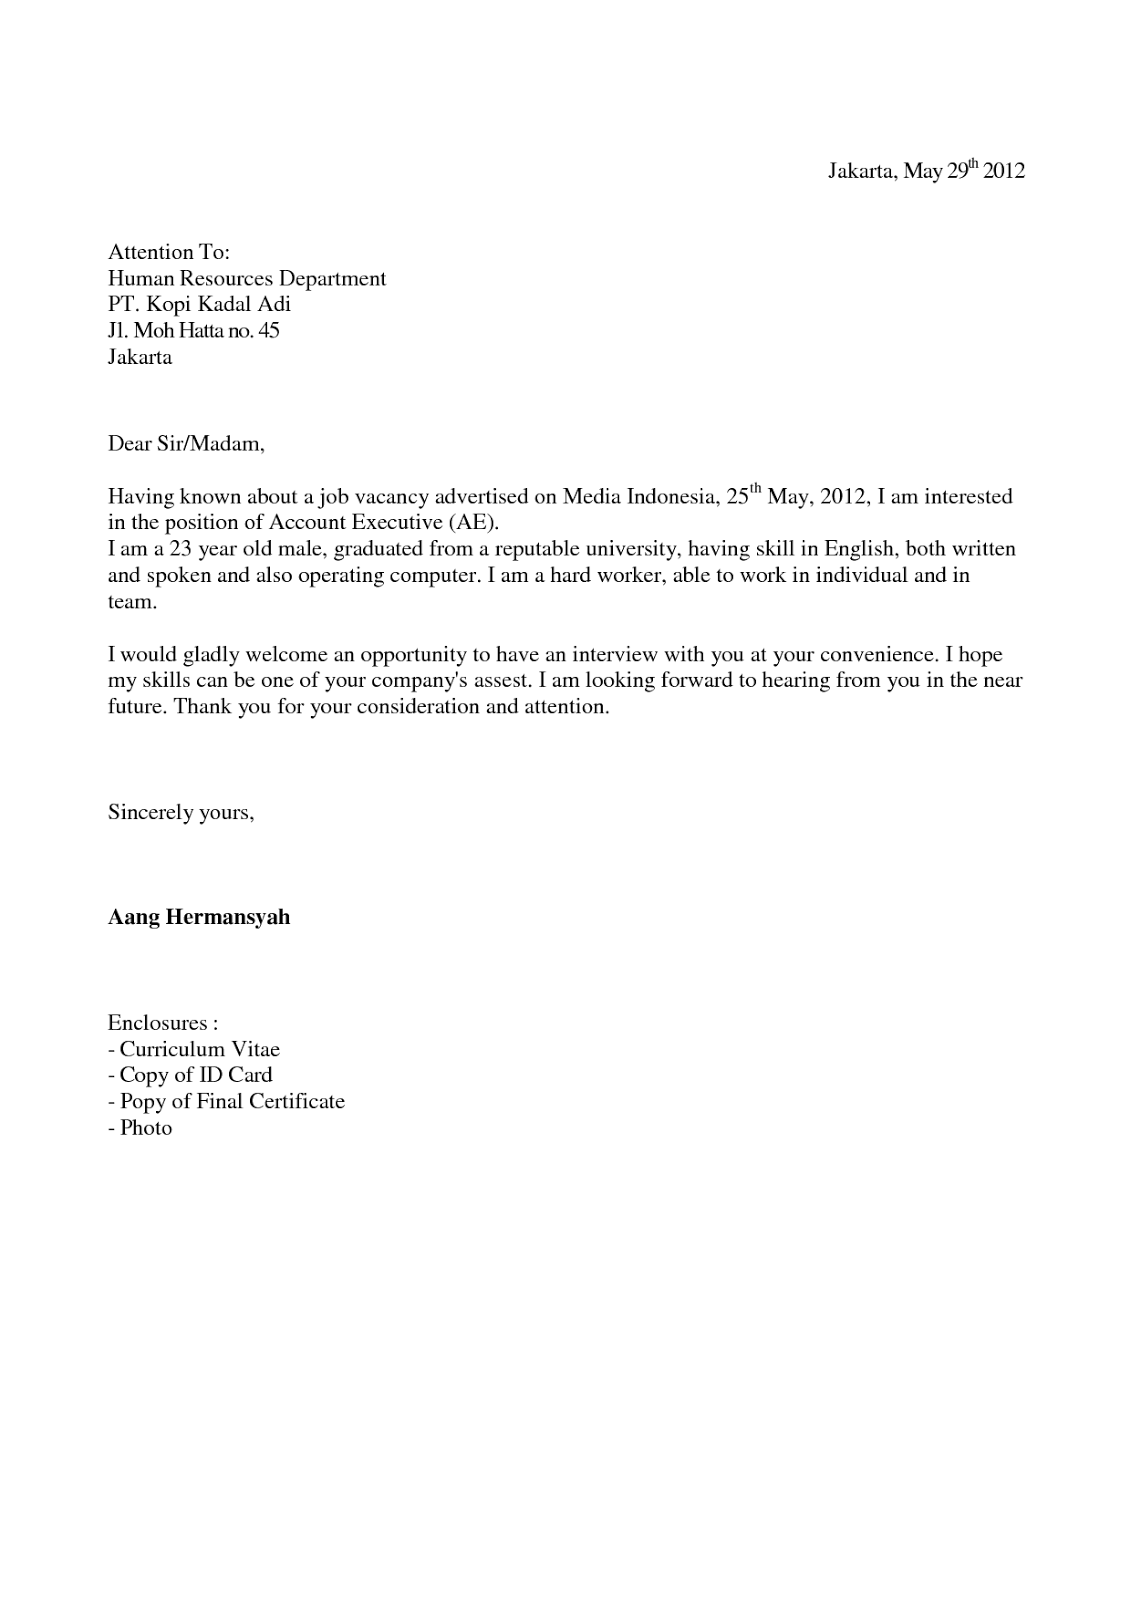 Contoh Surat Lamaran Kerja Pos Indonesia